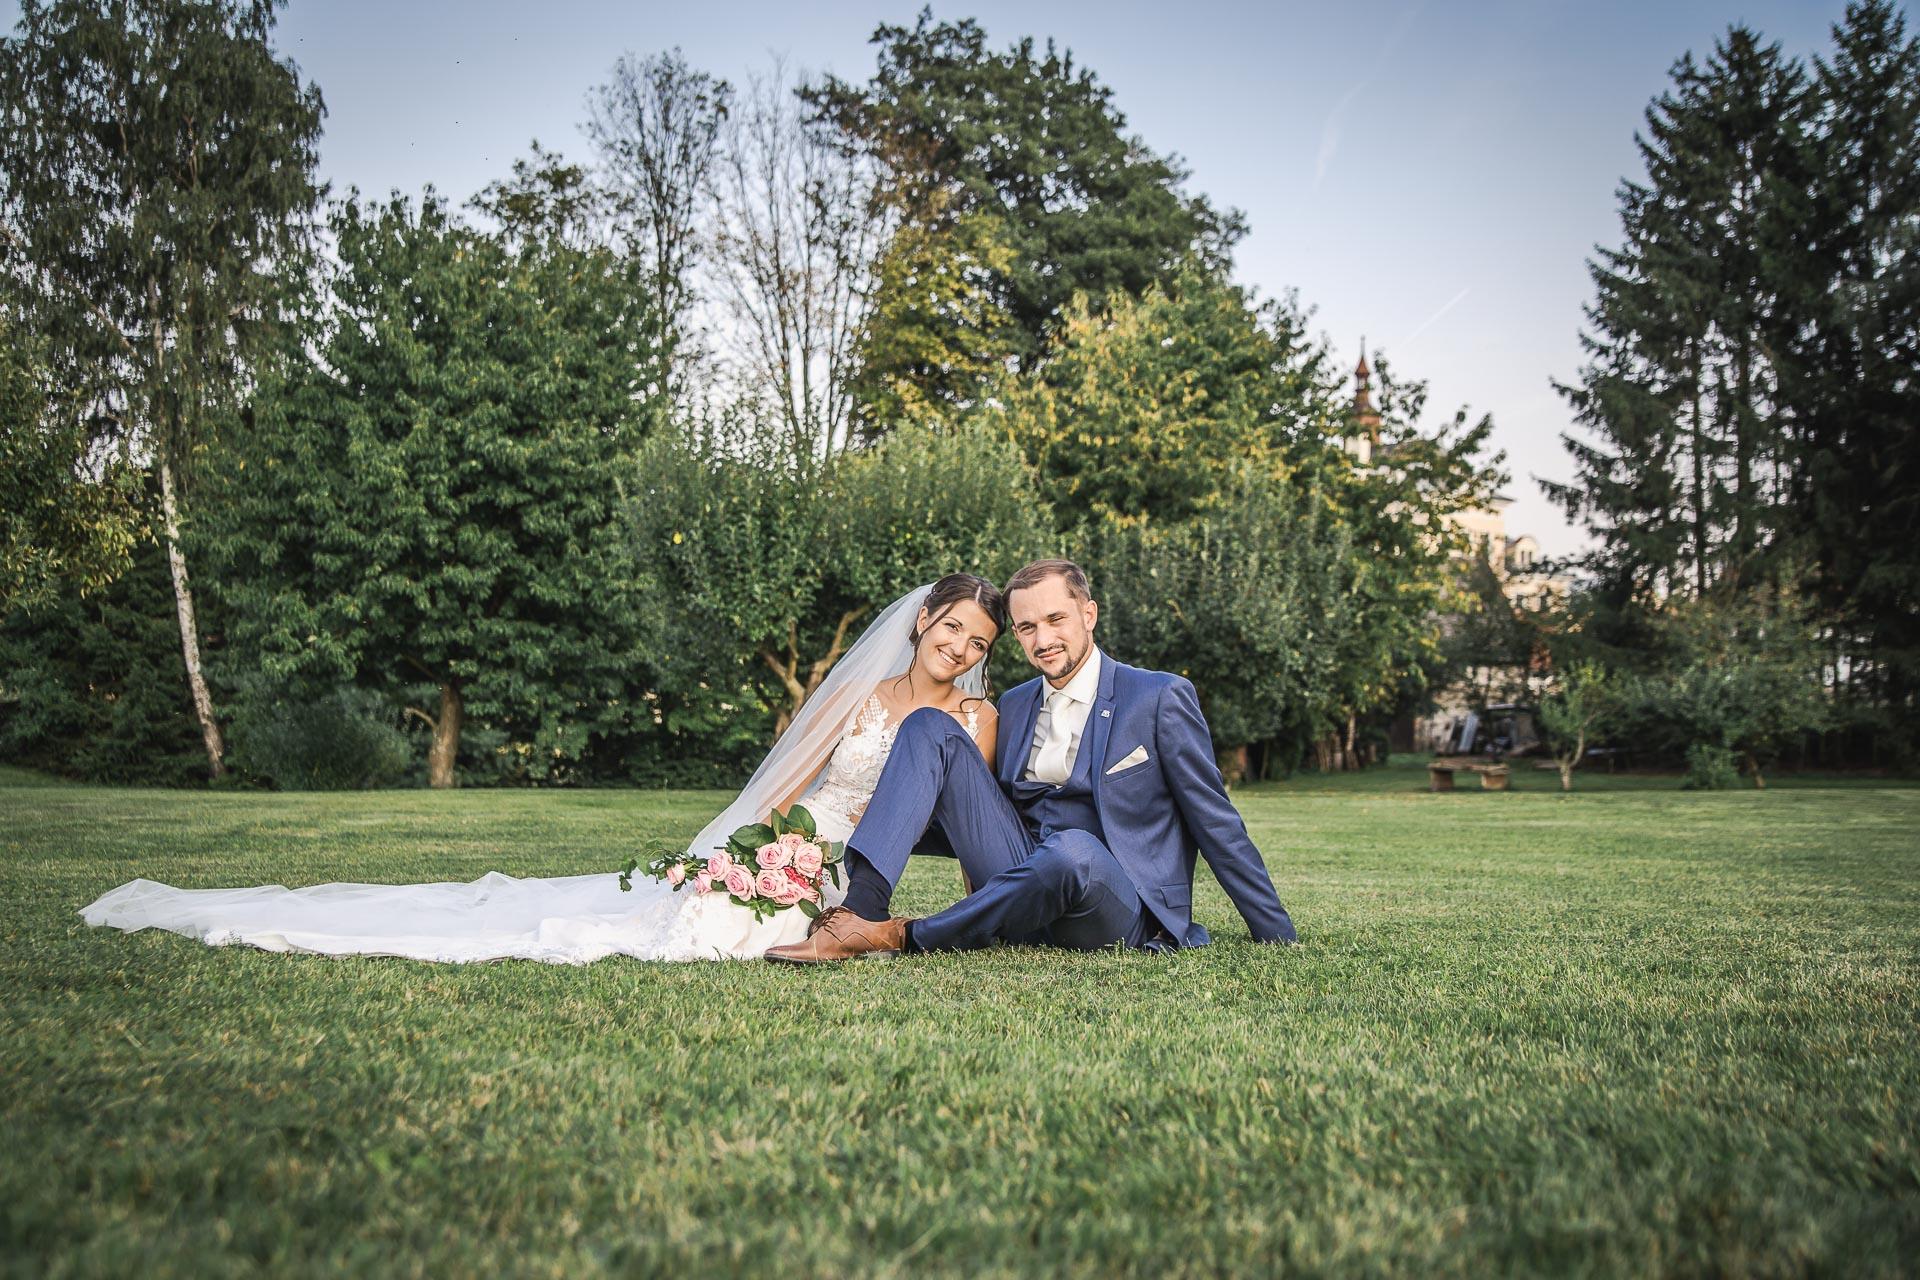 svatební-fotograf-wedding-svatebni-video-orlík-vltava-kostel-statek-stodola-boho-svatba-Beautyfoto-524